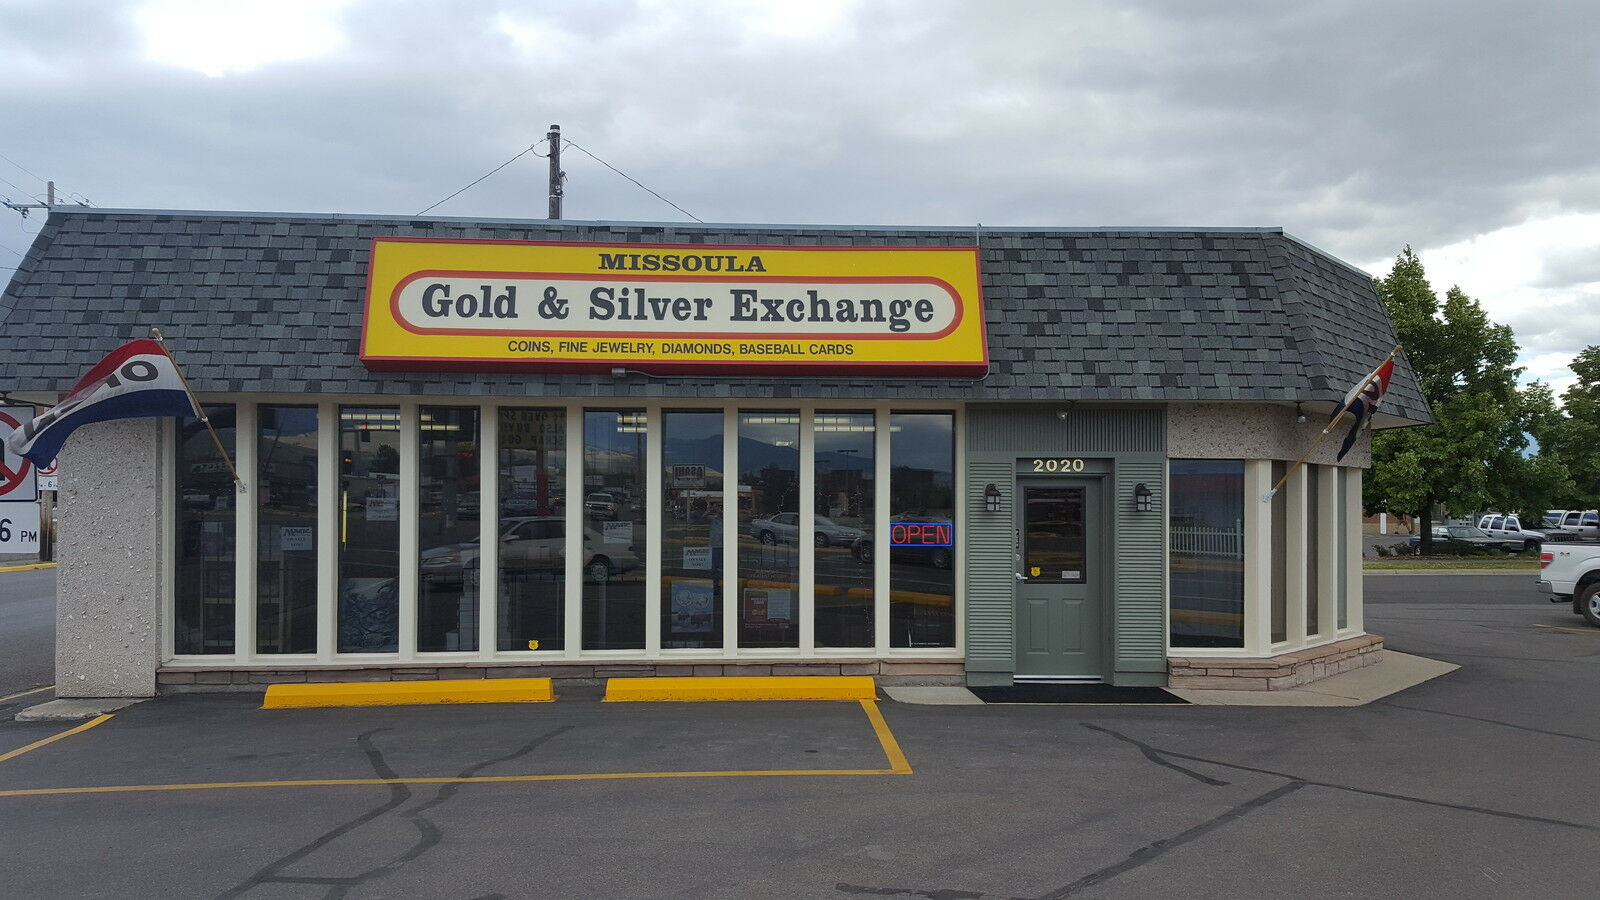 Items in Missoula Gold & Silver Exchange shop on eBay.